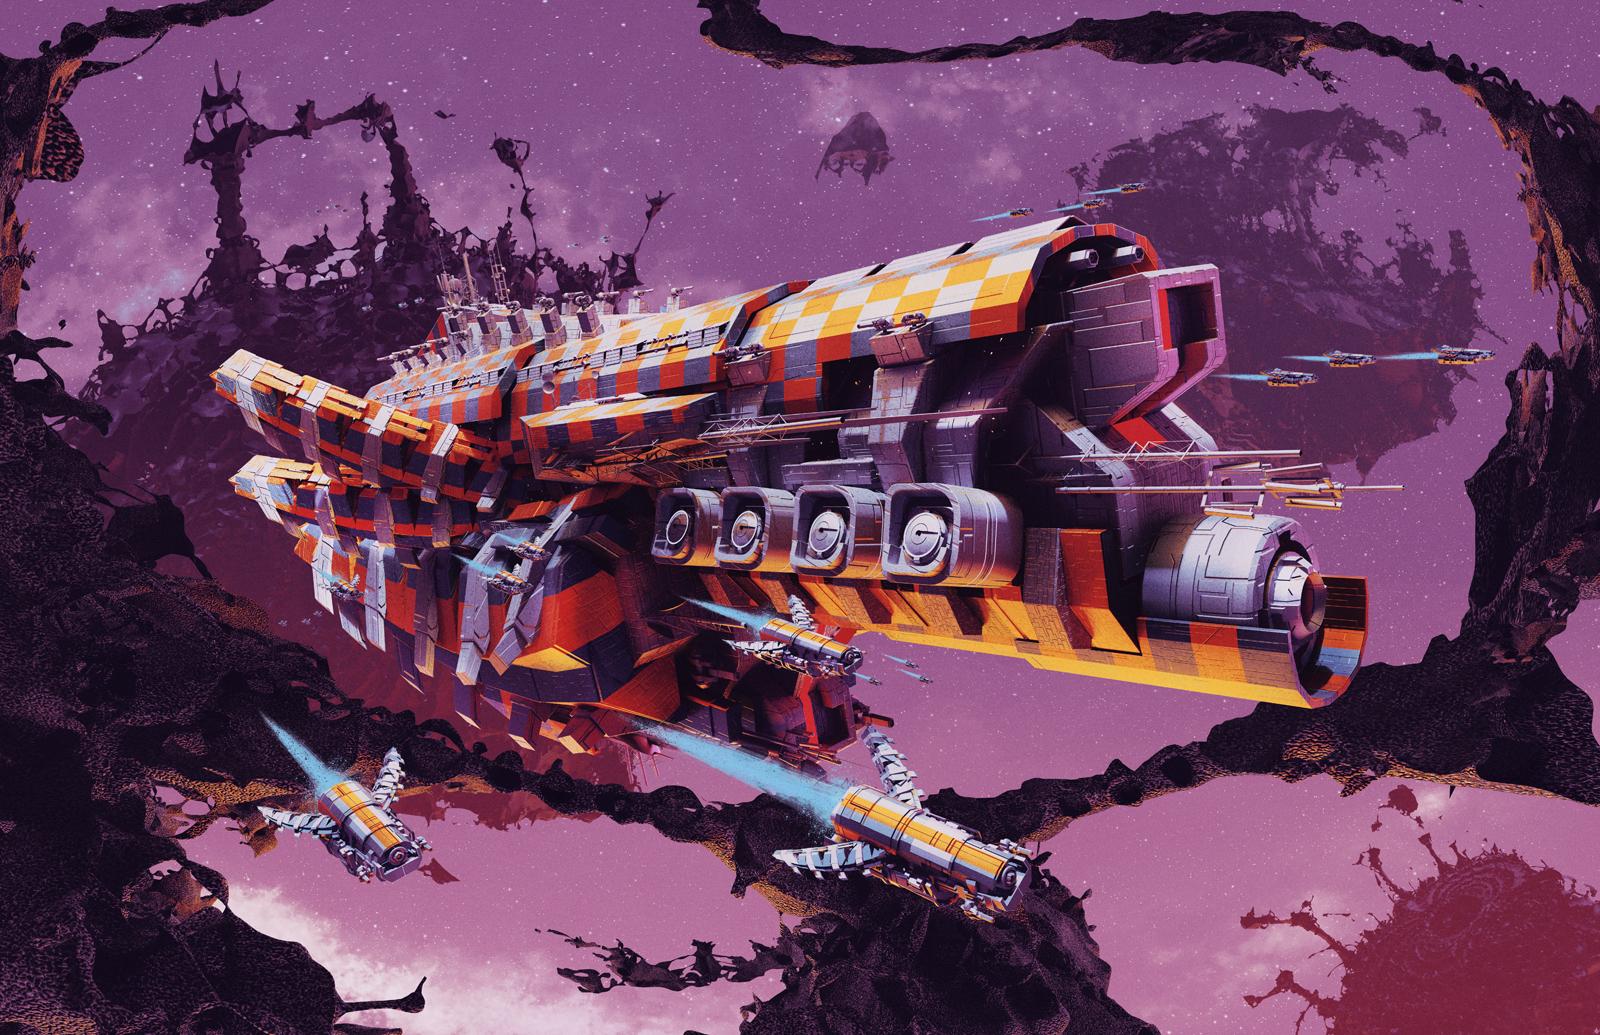 01-3FloydsBrewing-Battleship-1.jpg